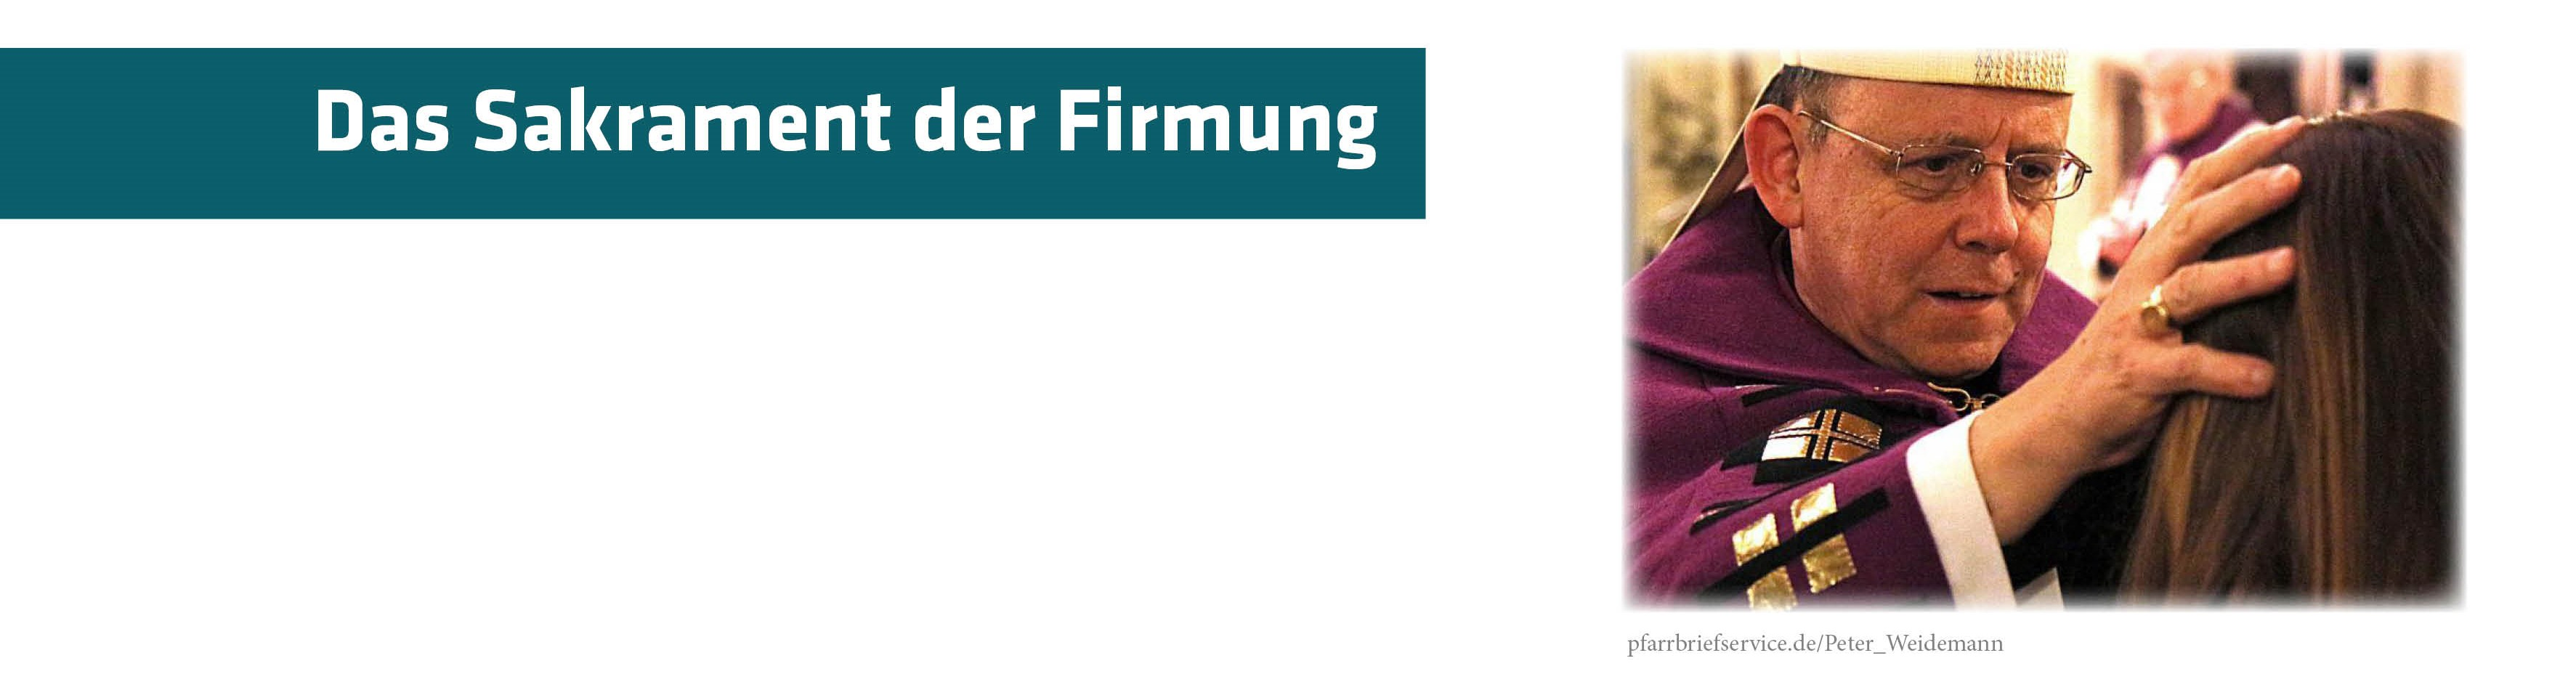 Firmung_cut